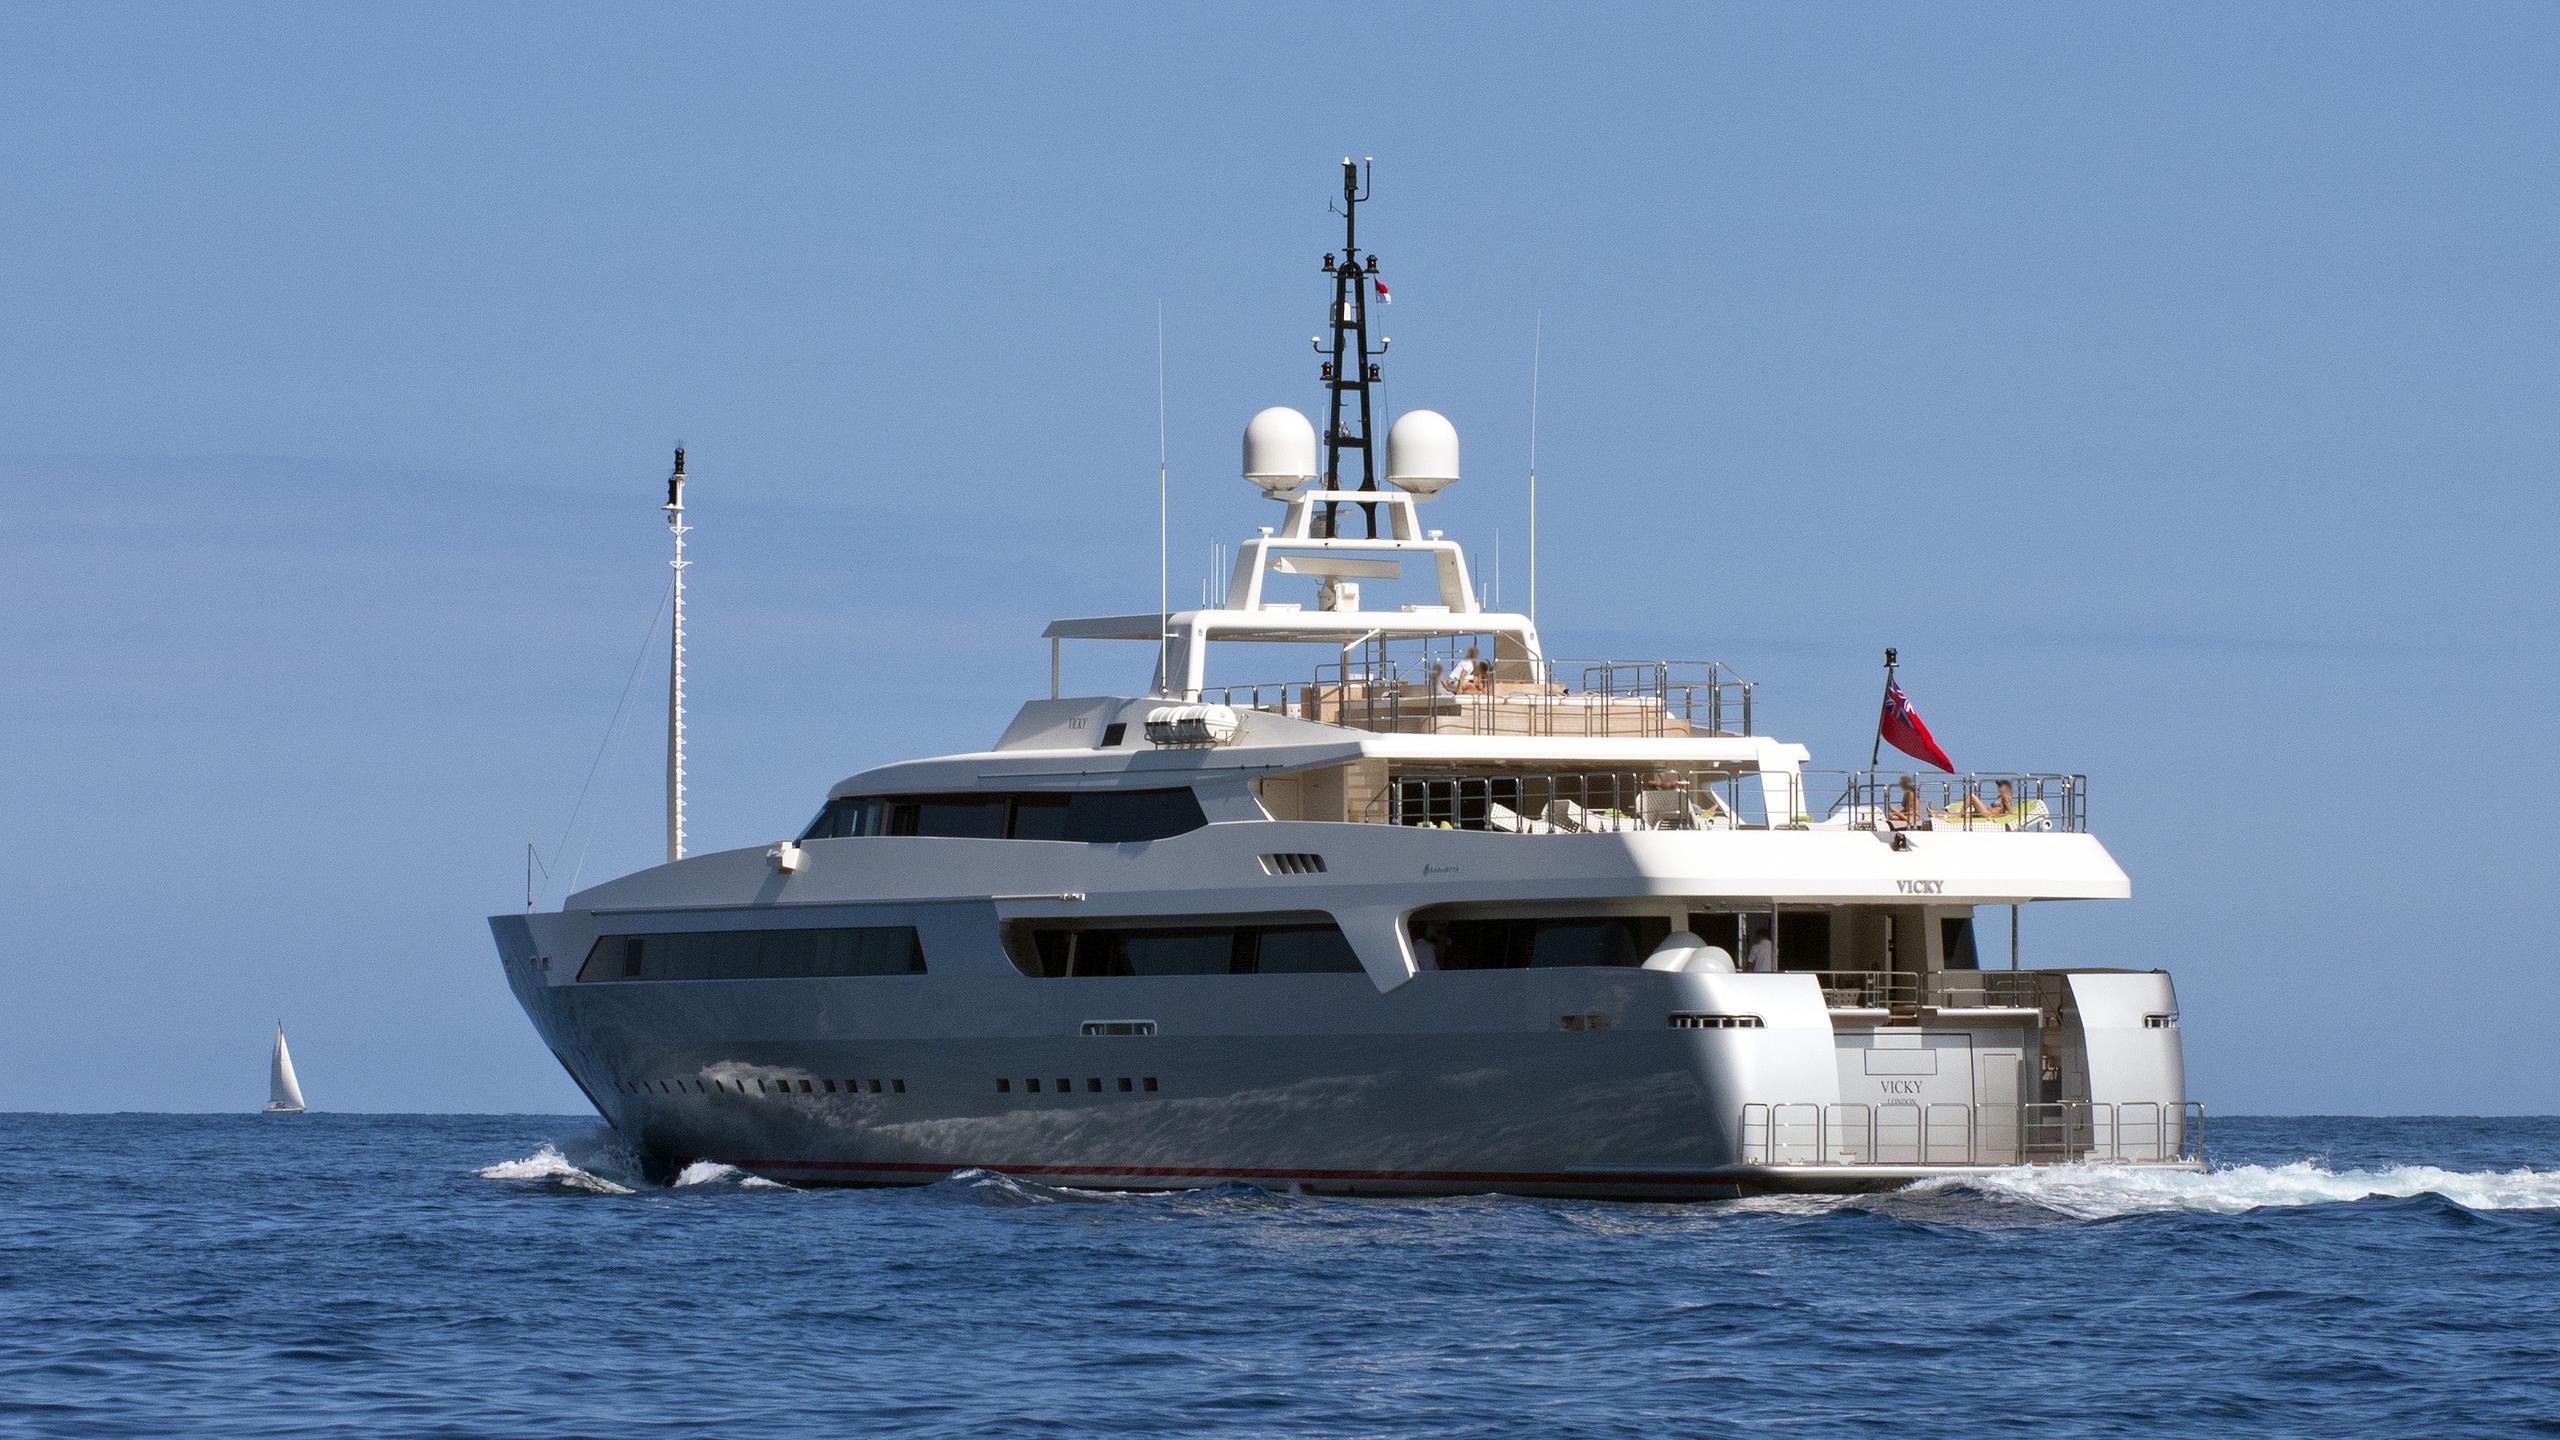 vicky-motor-yacht-baglietto-2008-59m-stern-half-profile